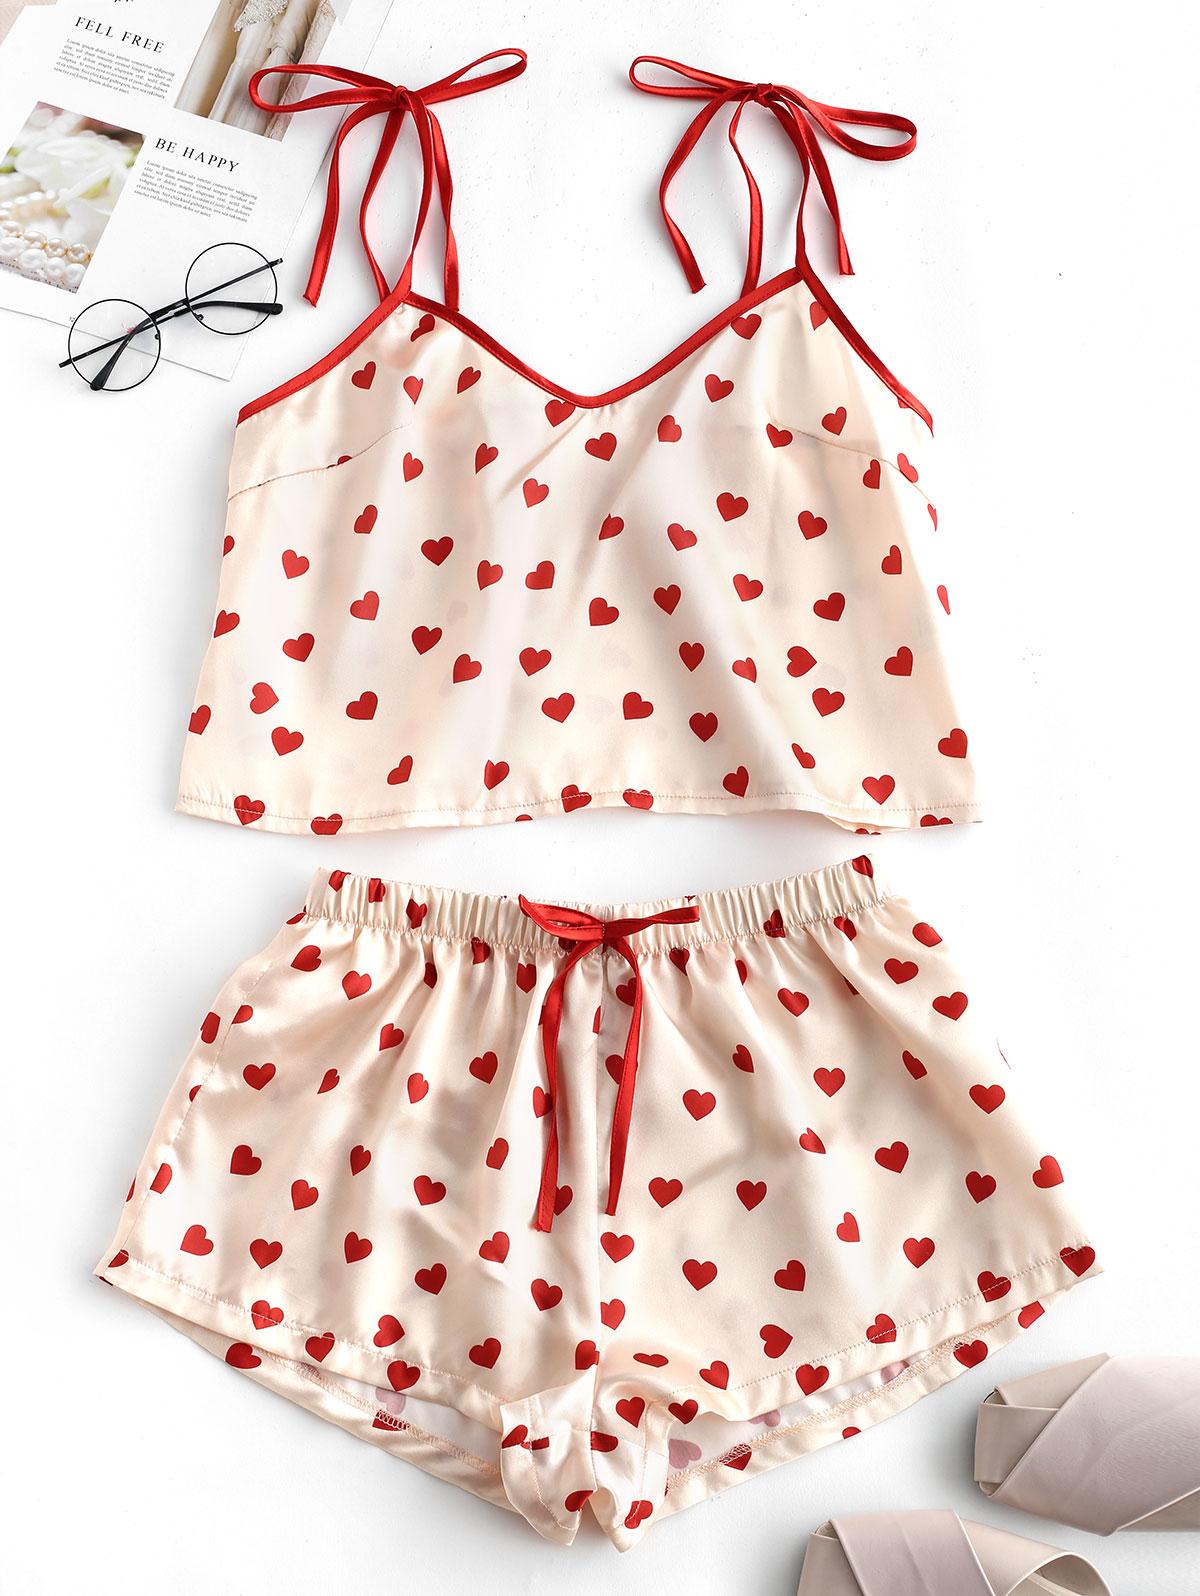 ZAFUL Summer Spaghetti Strap Heart Print Cami Bowknot Crop Top And Shorts   Pajama     Sets   Sleeveless Camisole Lounge Women Nightwear